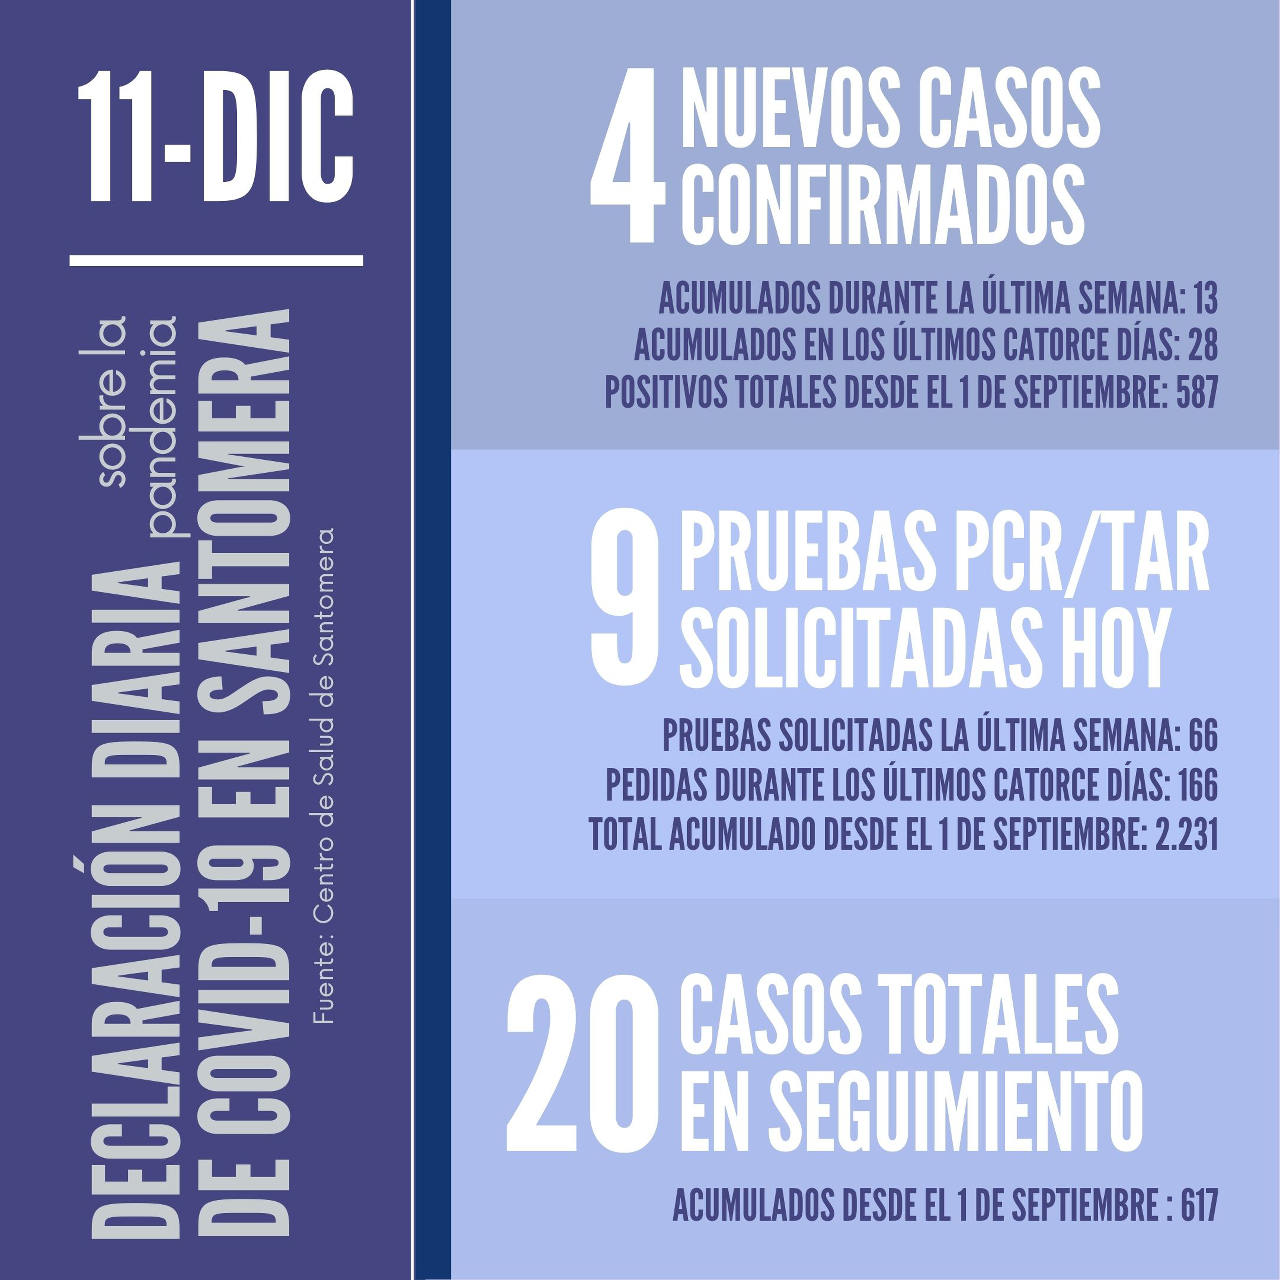 20201211_Datos COVID-19 Santomera